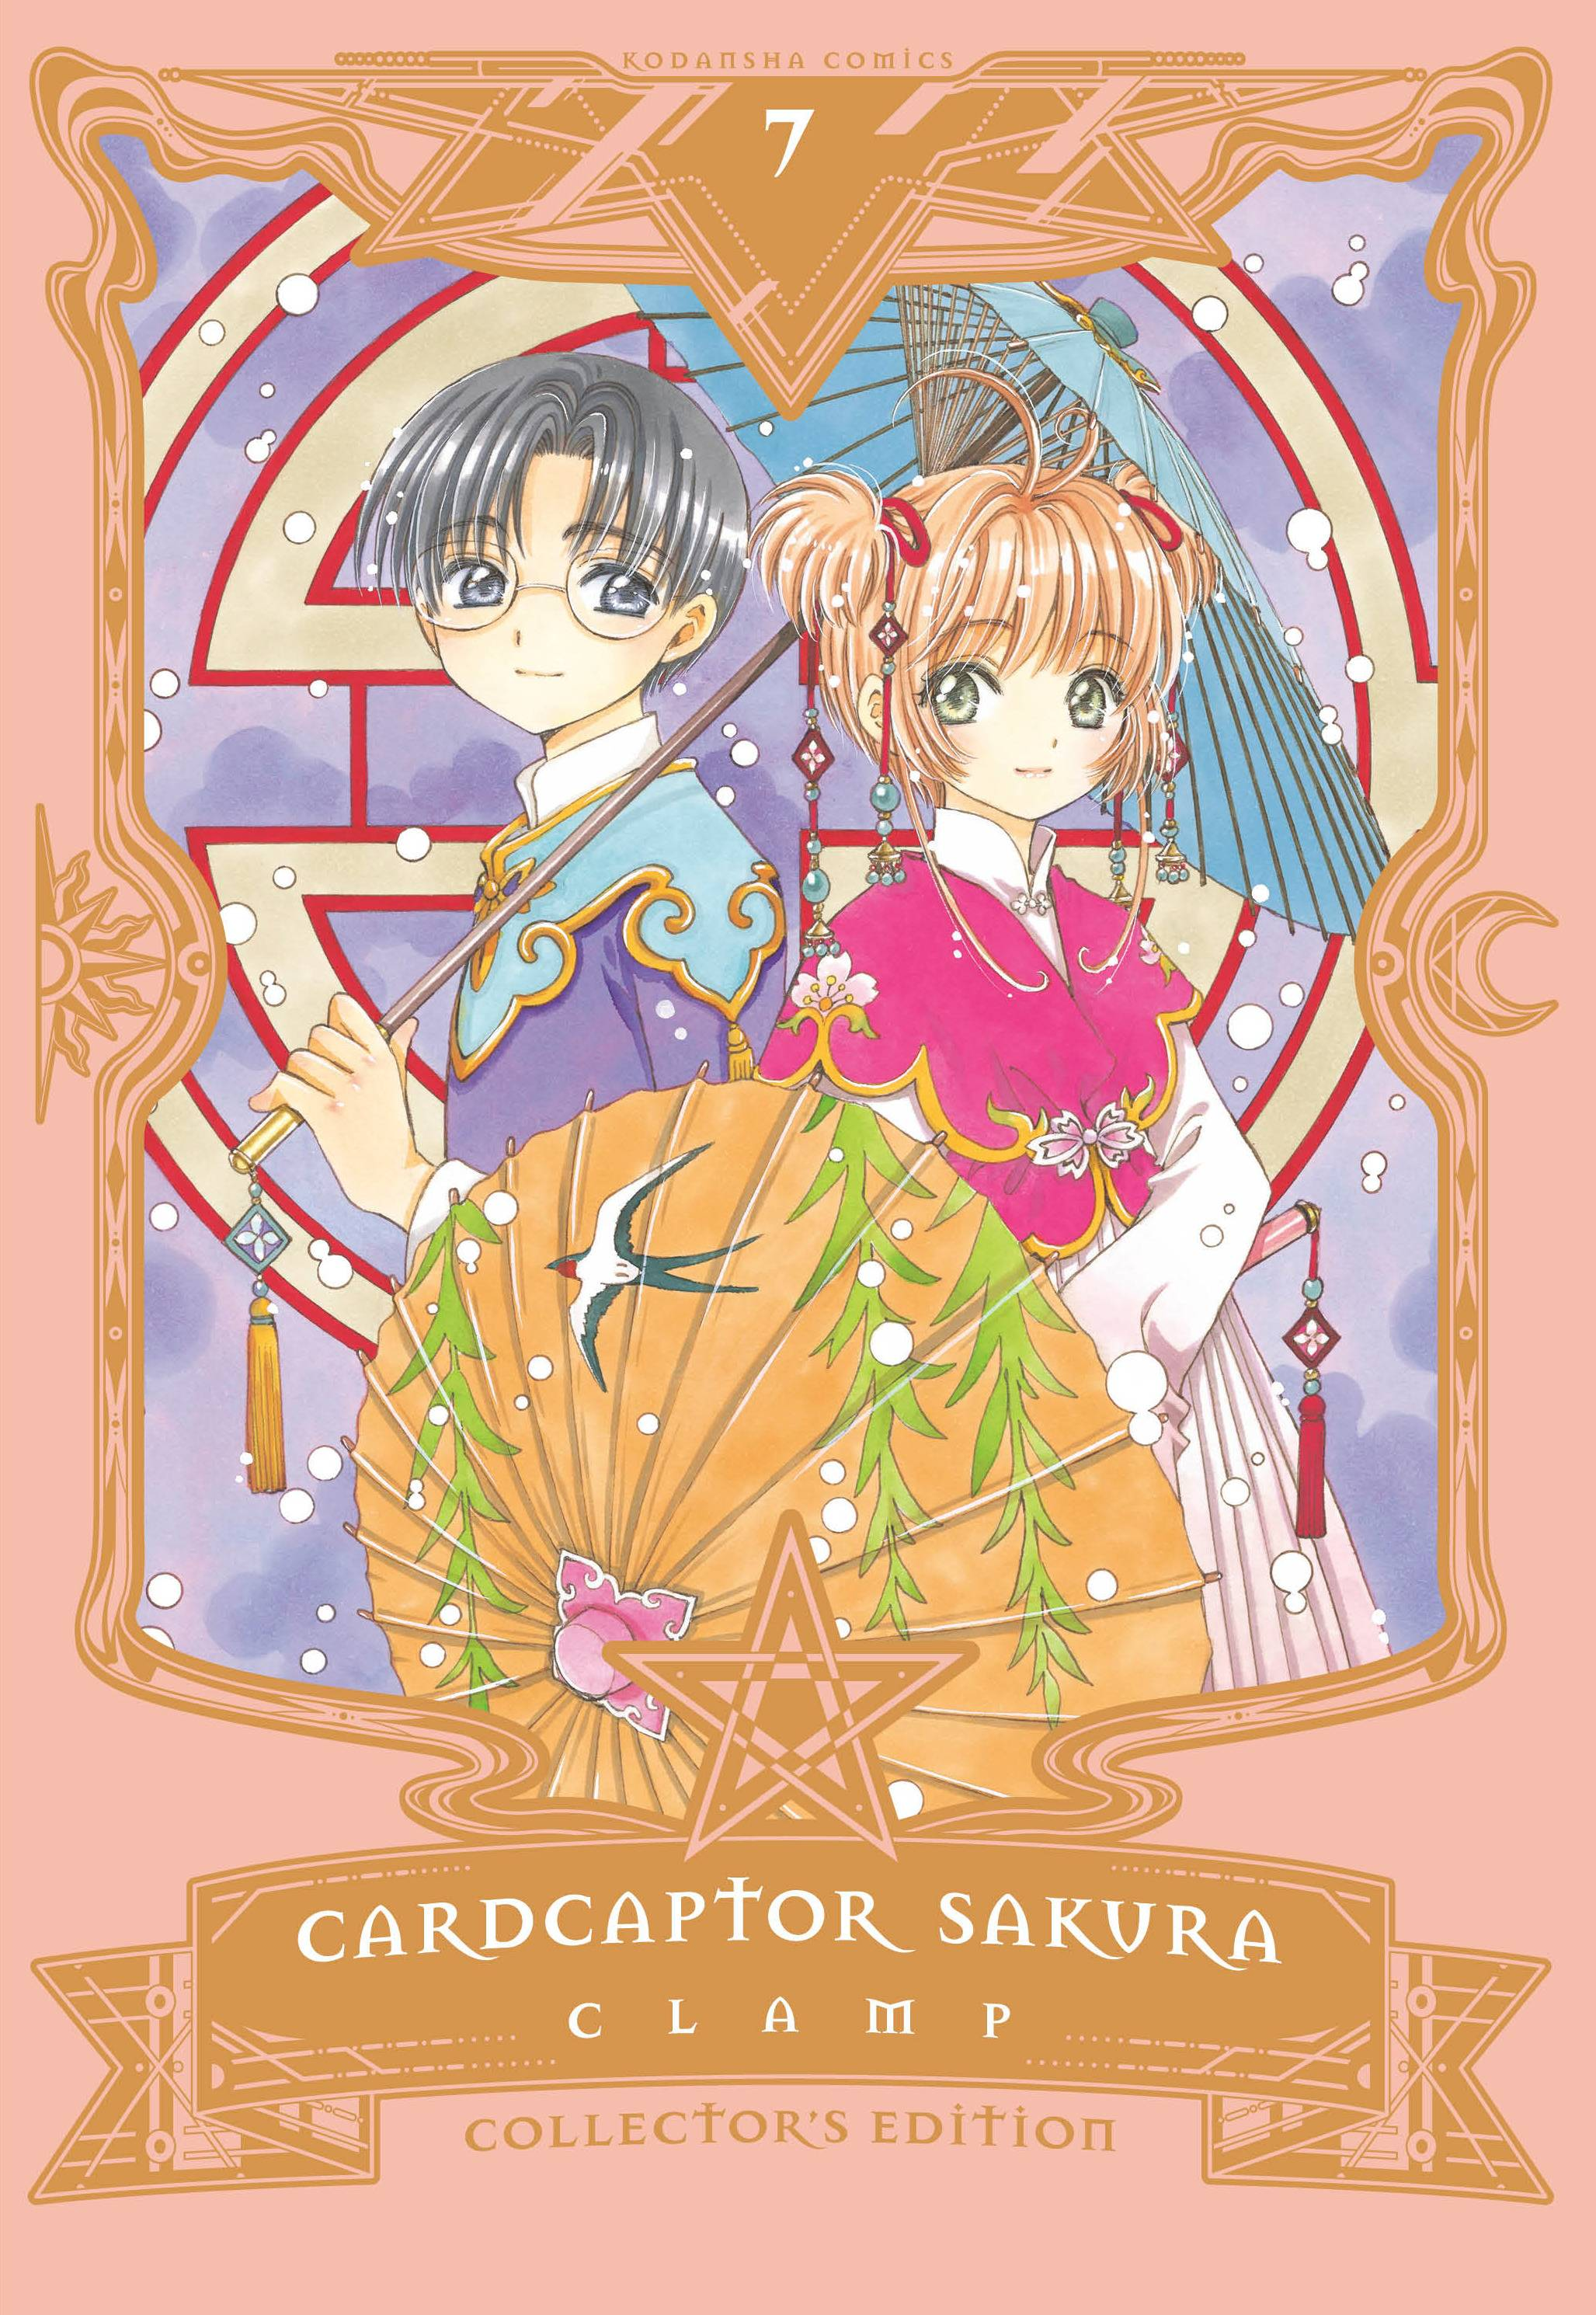 CARDCAPTOR SAKURA COLL ED HC 07